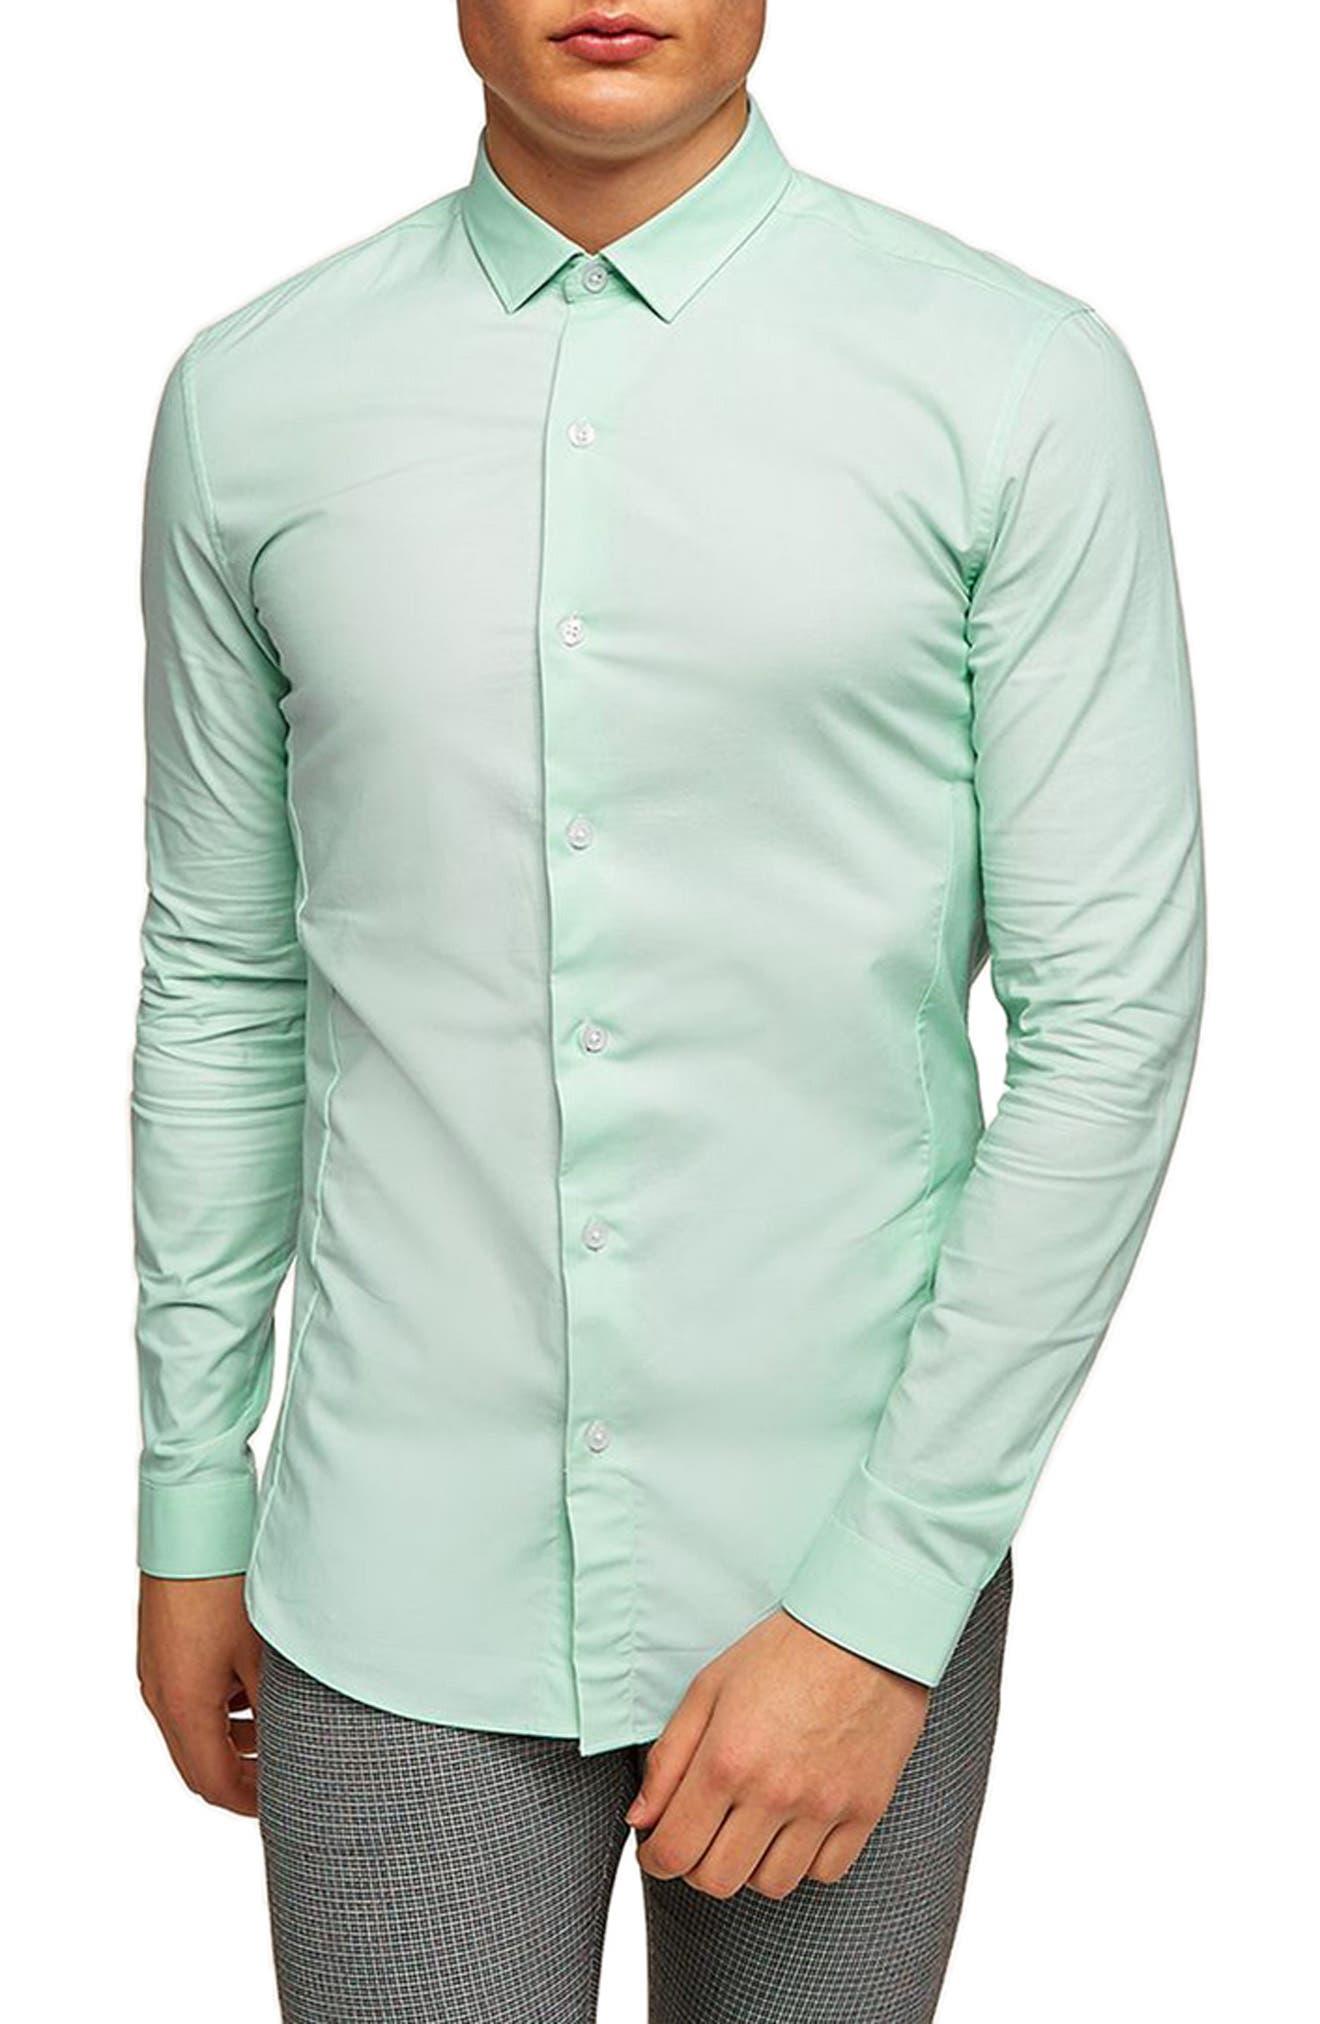 Topman Muscle Fit Textured Shirt